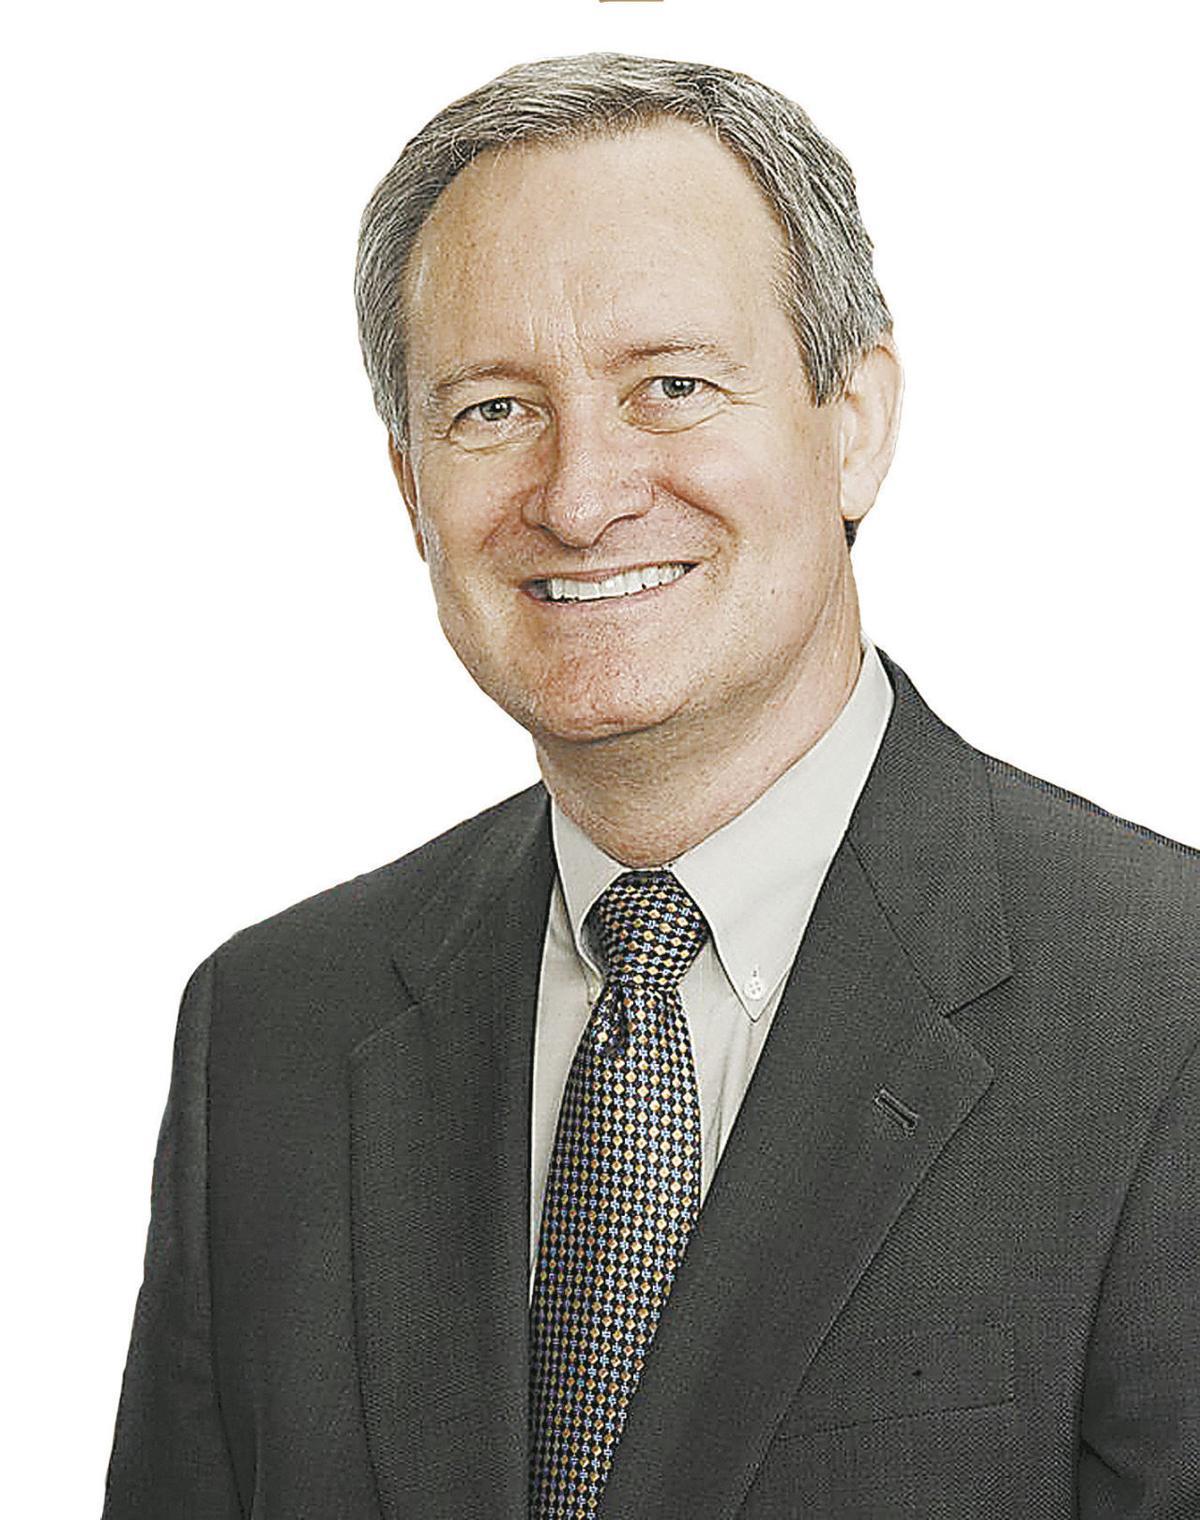 U.S. Senator Mike Crapo